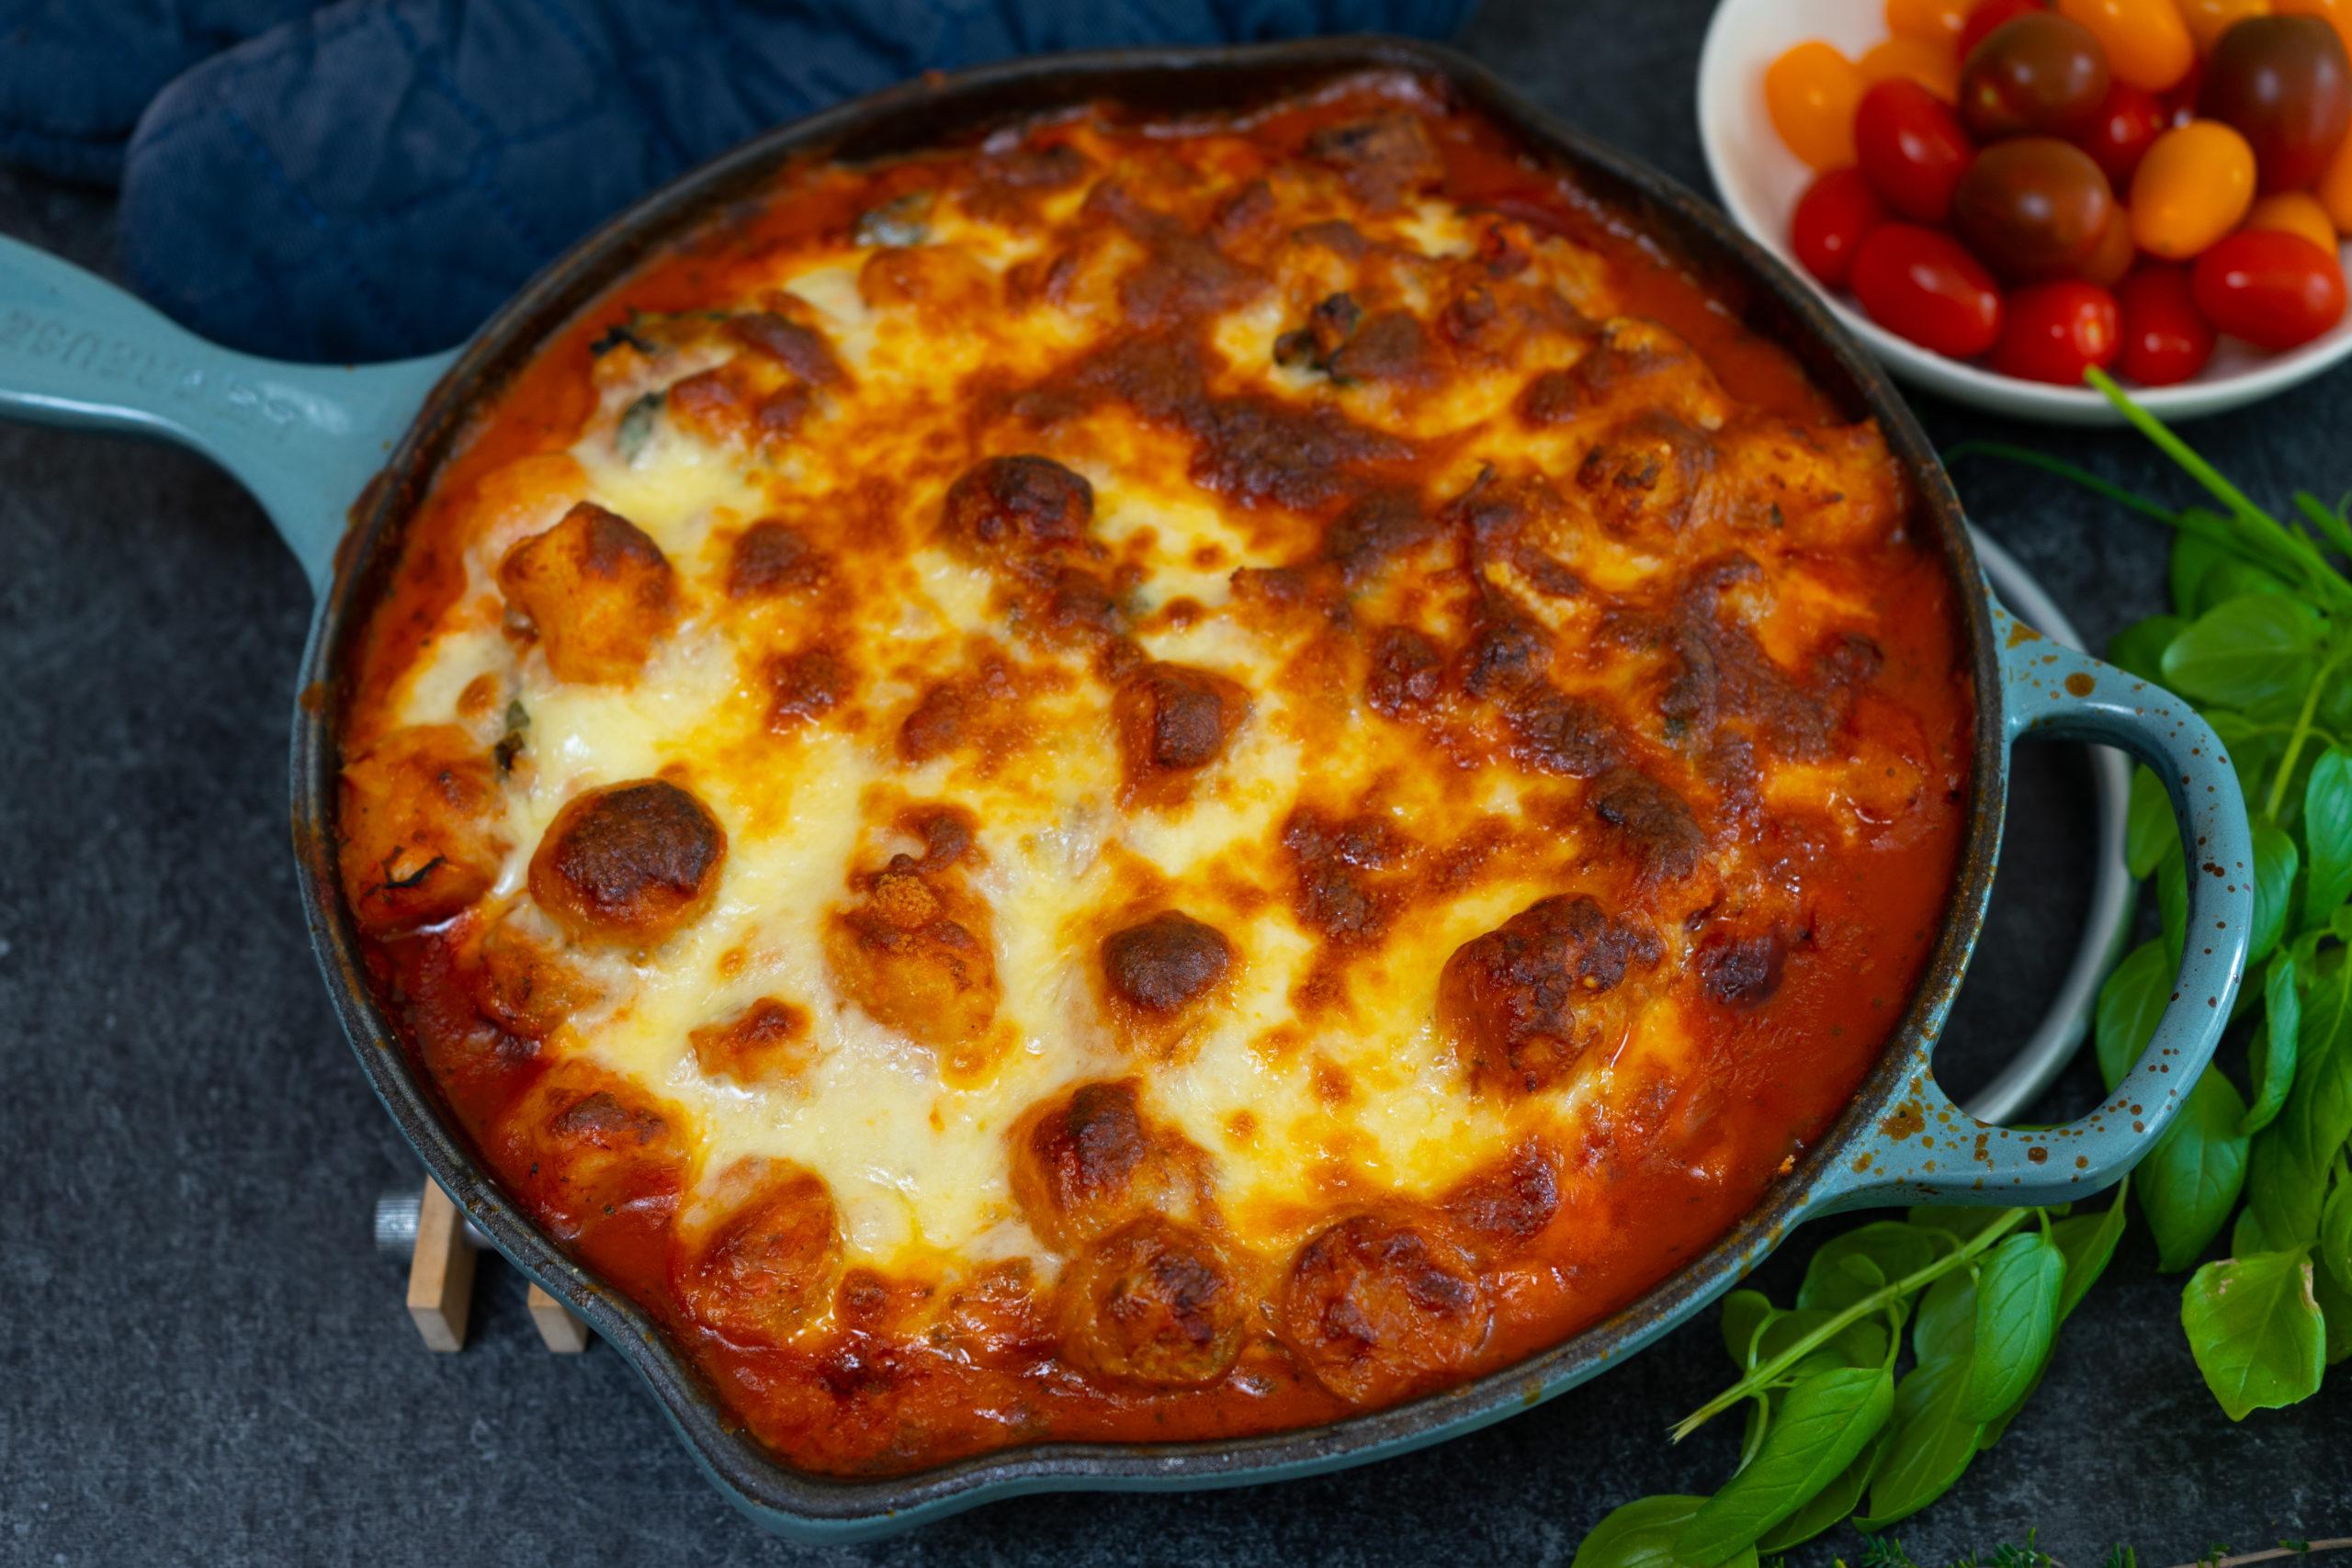 Kale gnocchi lasagna